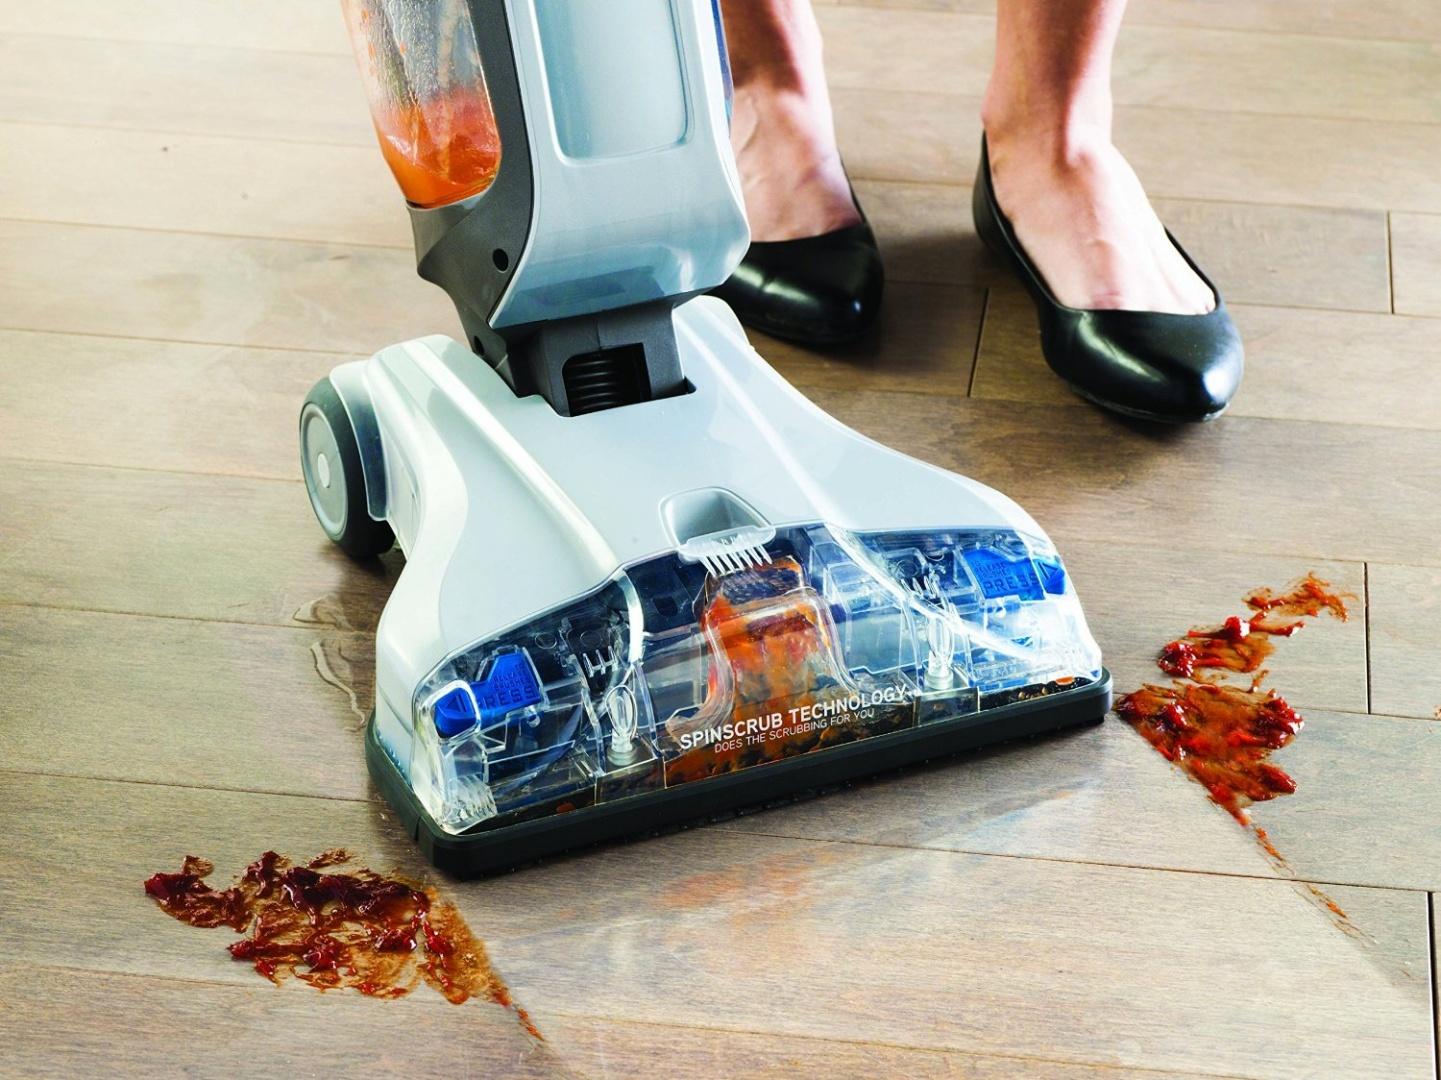 VAX-Floormate-Cordless-Floor-Cleaner-Best-Price